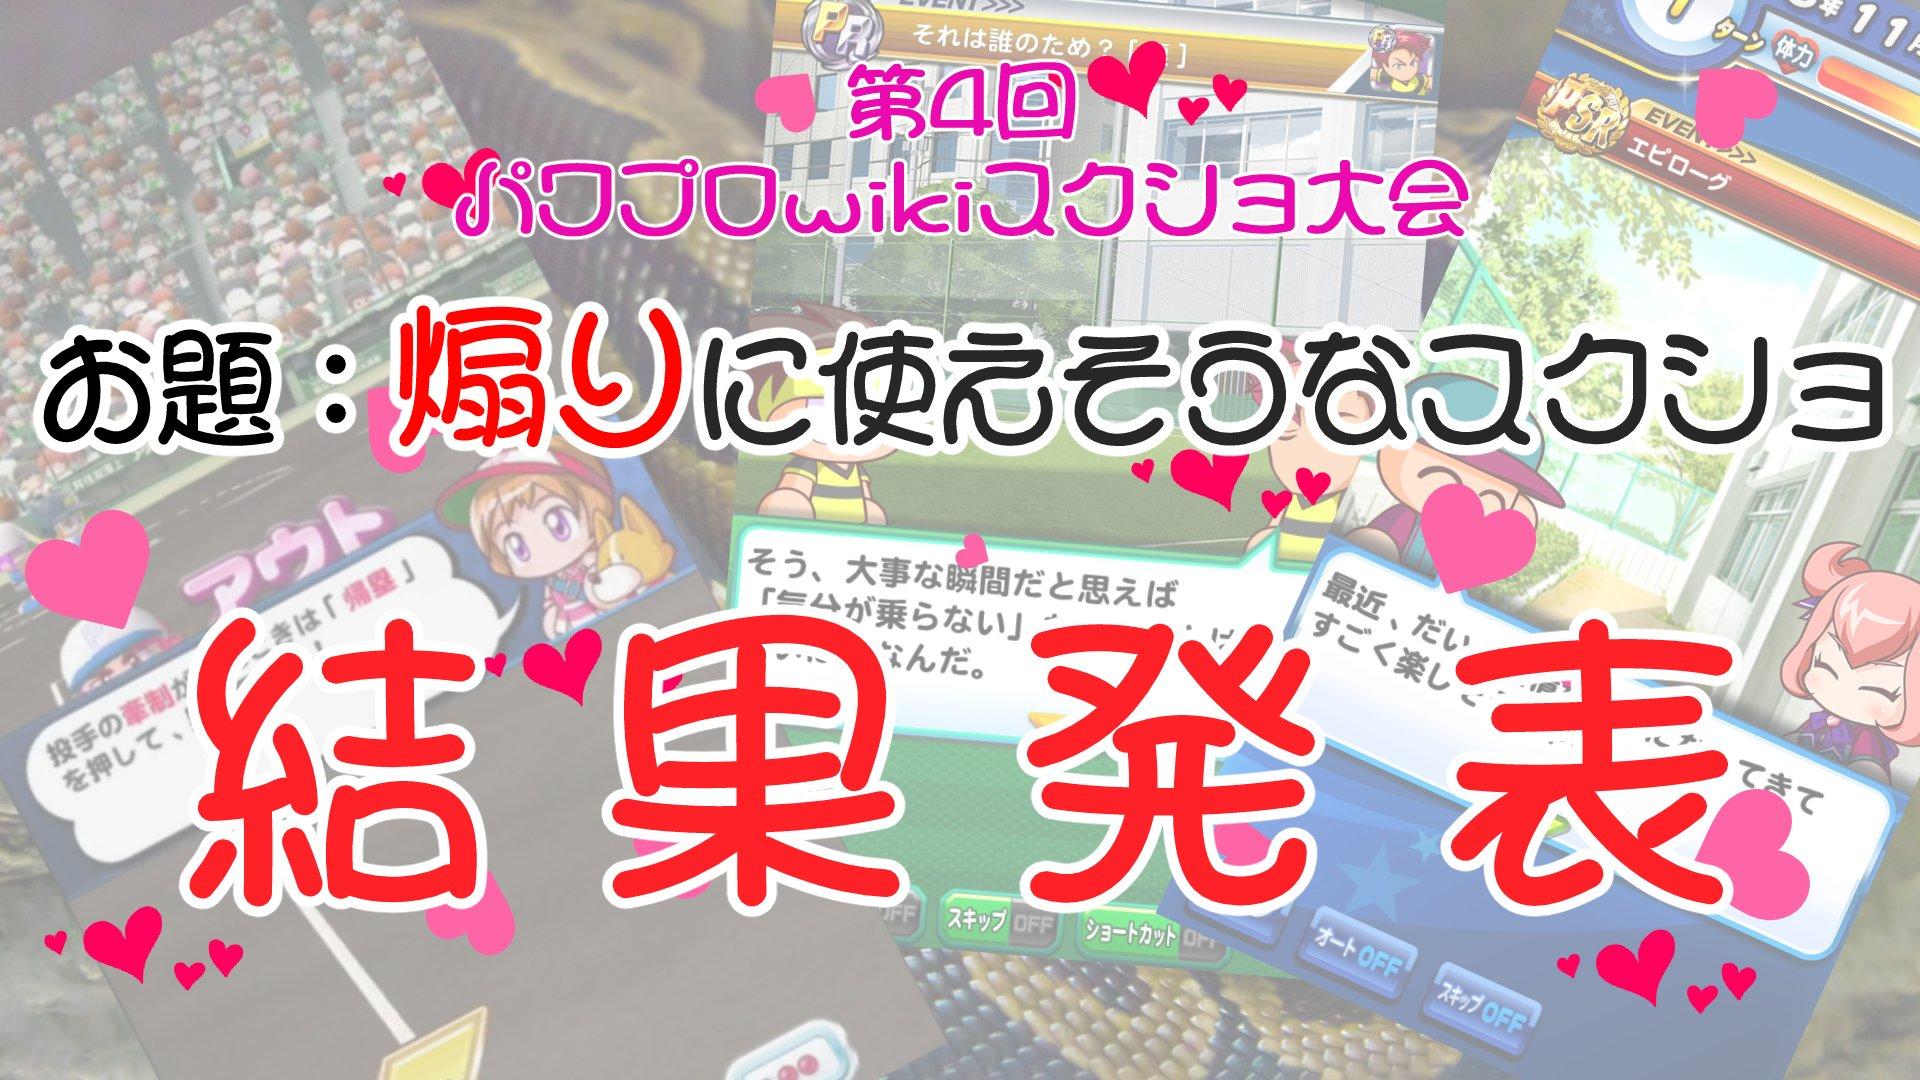 /theme/famitsu/pawapuro/images/banner/wikiss4